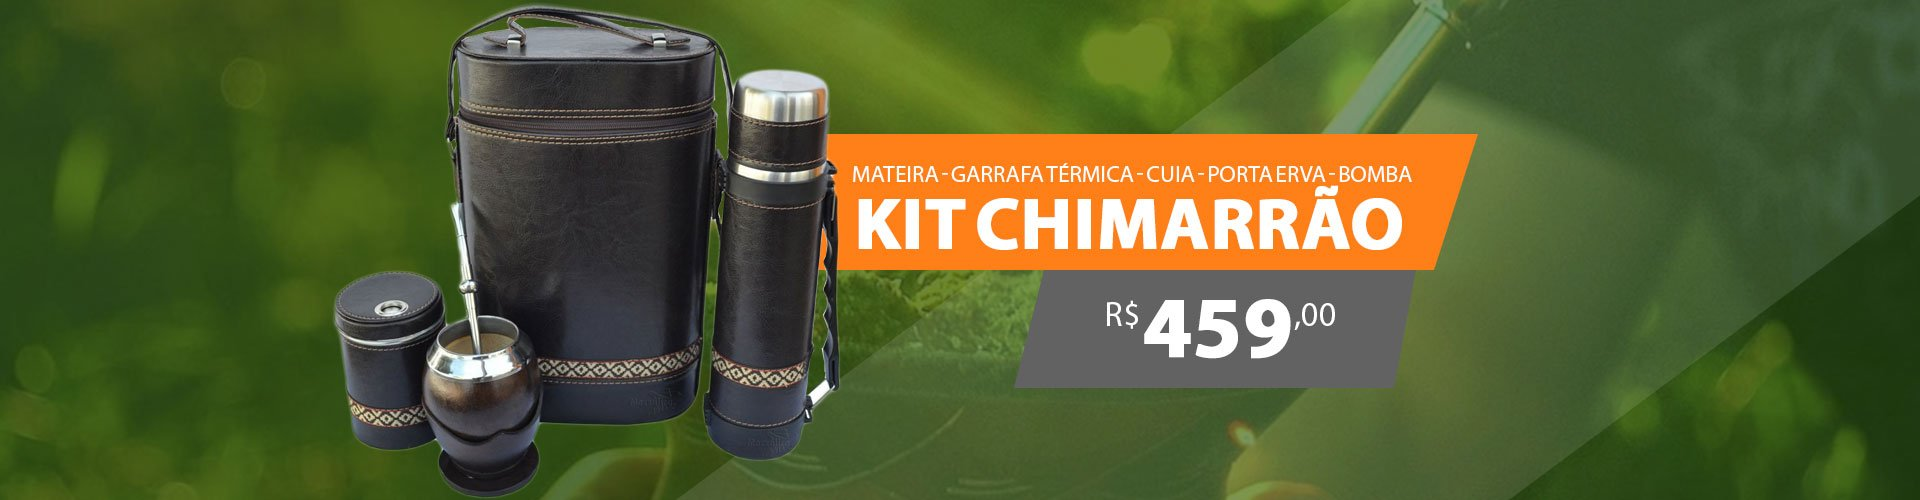 Kit Chimarrão